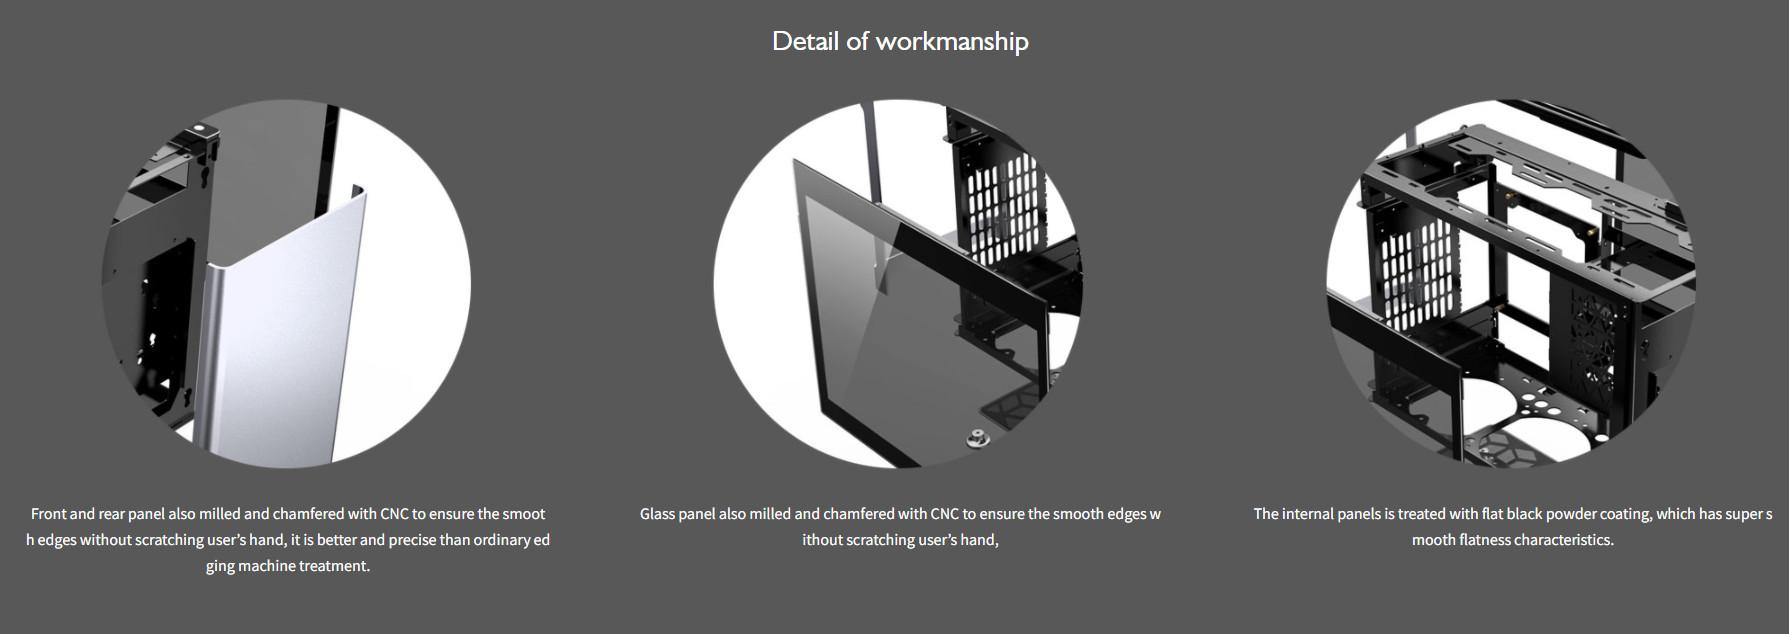 Case JonsboPlus  i100-G Silver  (Mini Tower/Màu Bạc) giới thiệu 2